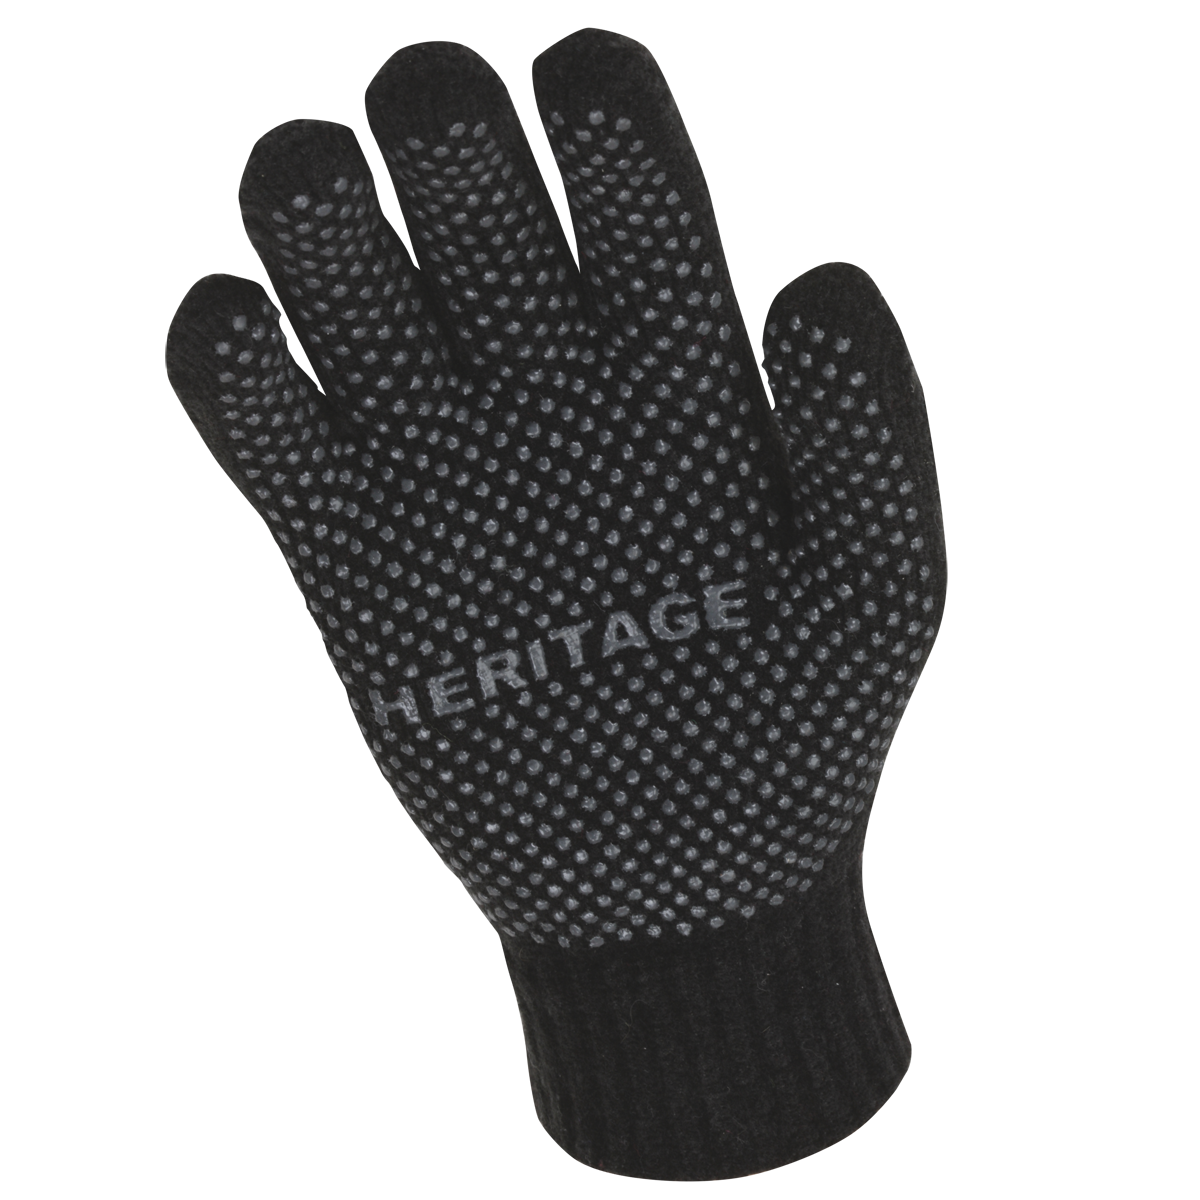 Mens gloves old navy - Popular Knit Gloves Men Buy Cheap Lots From China Old Navy